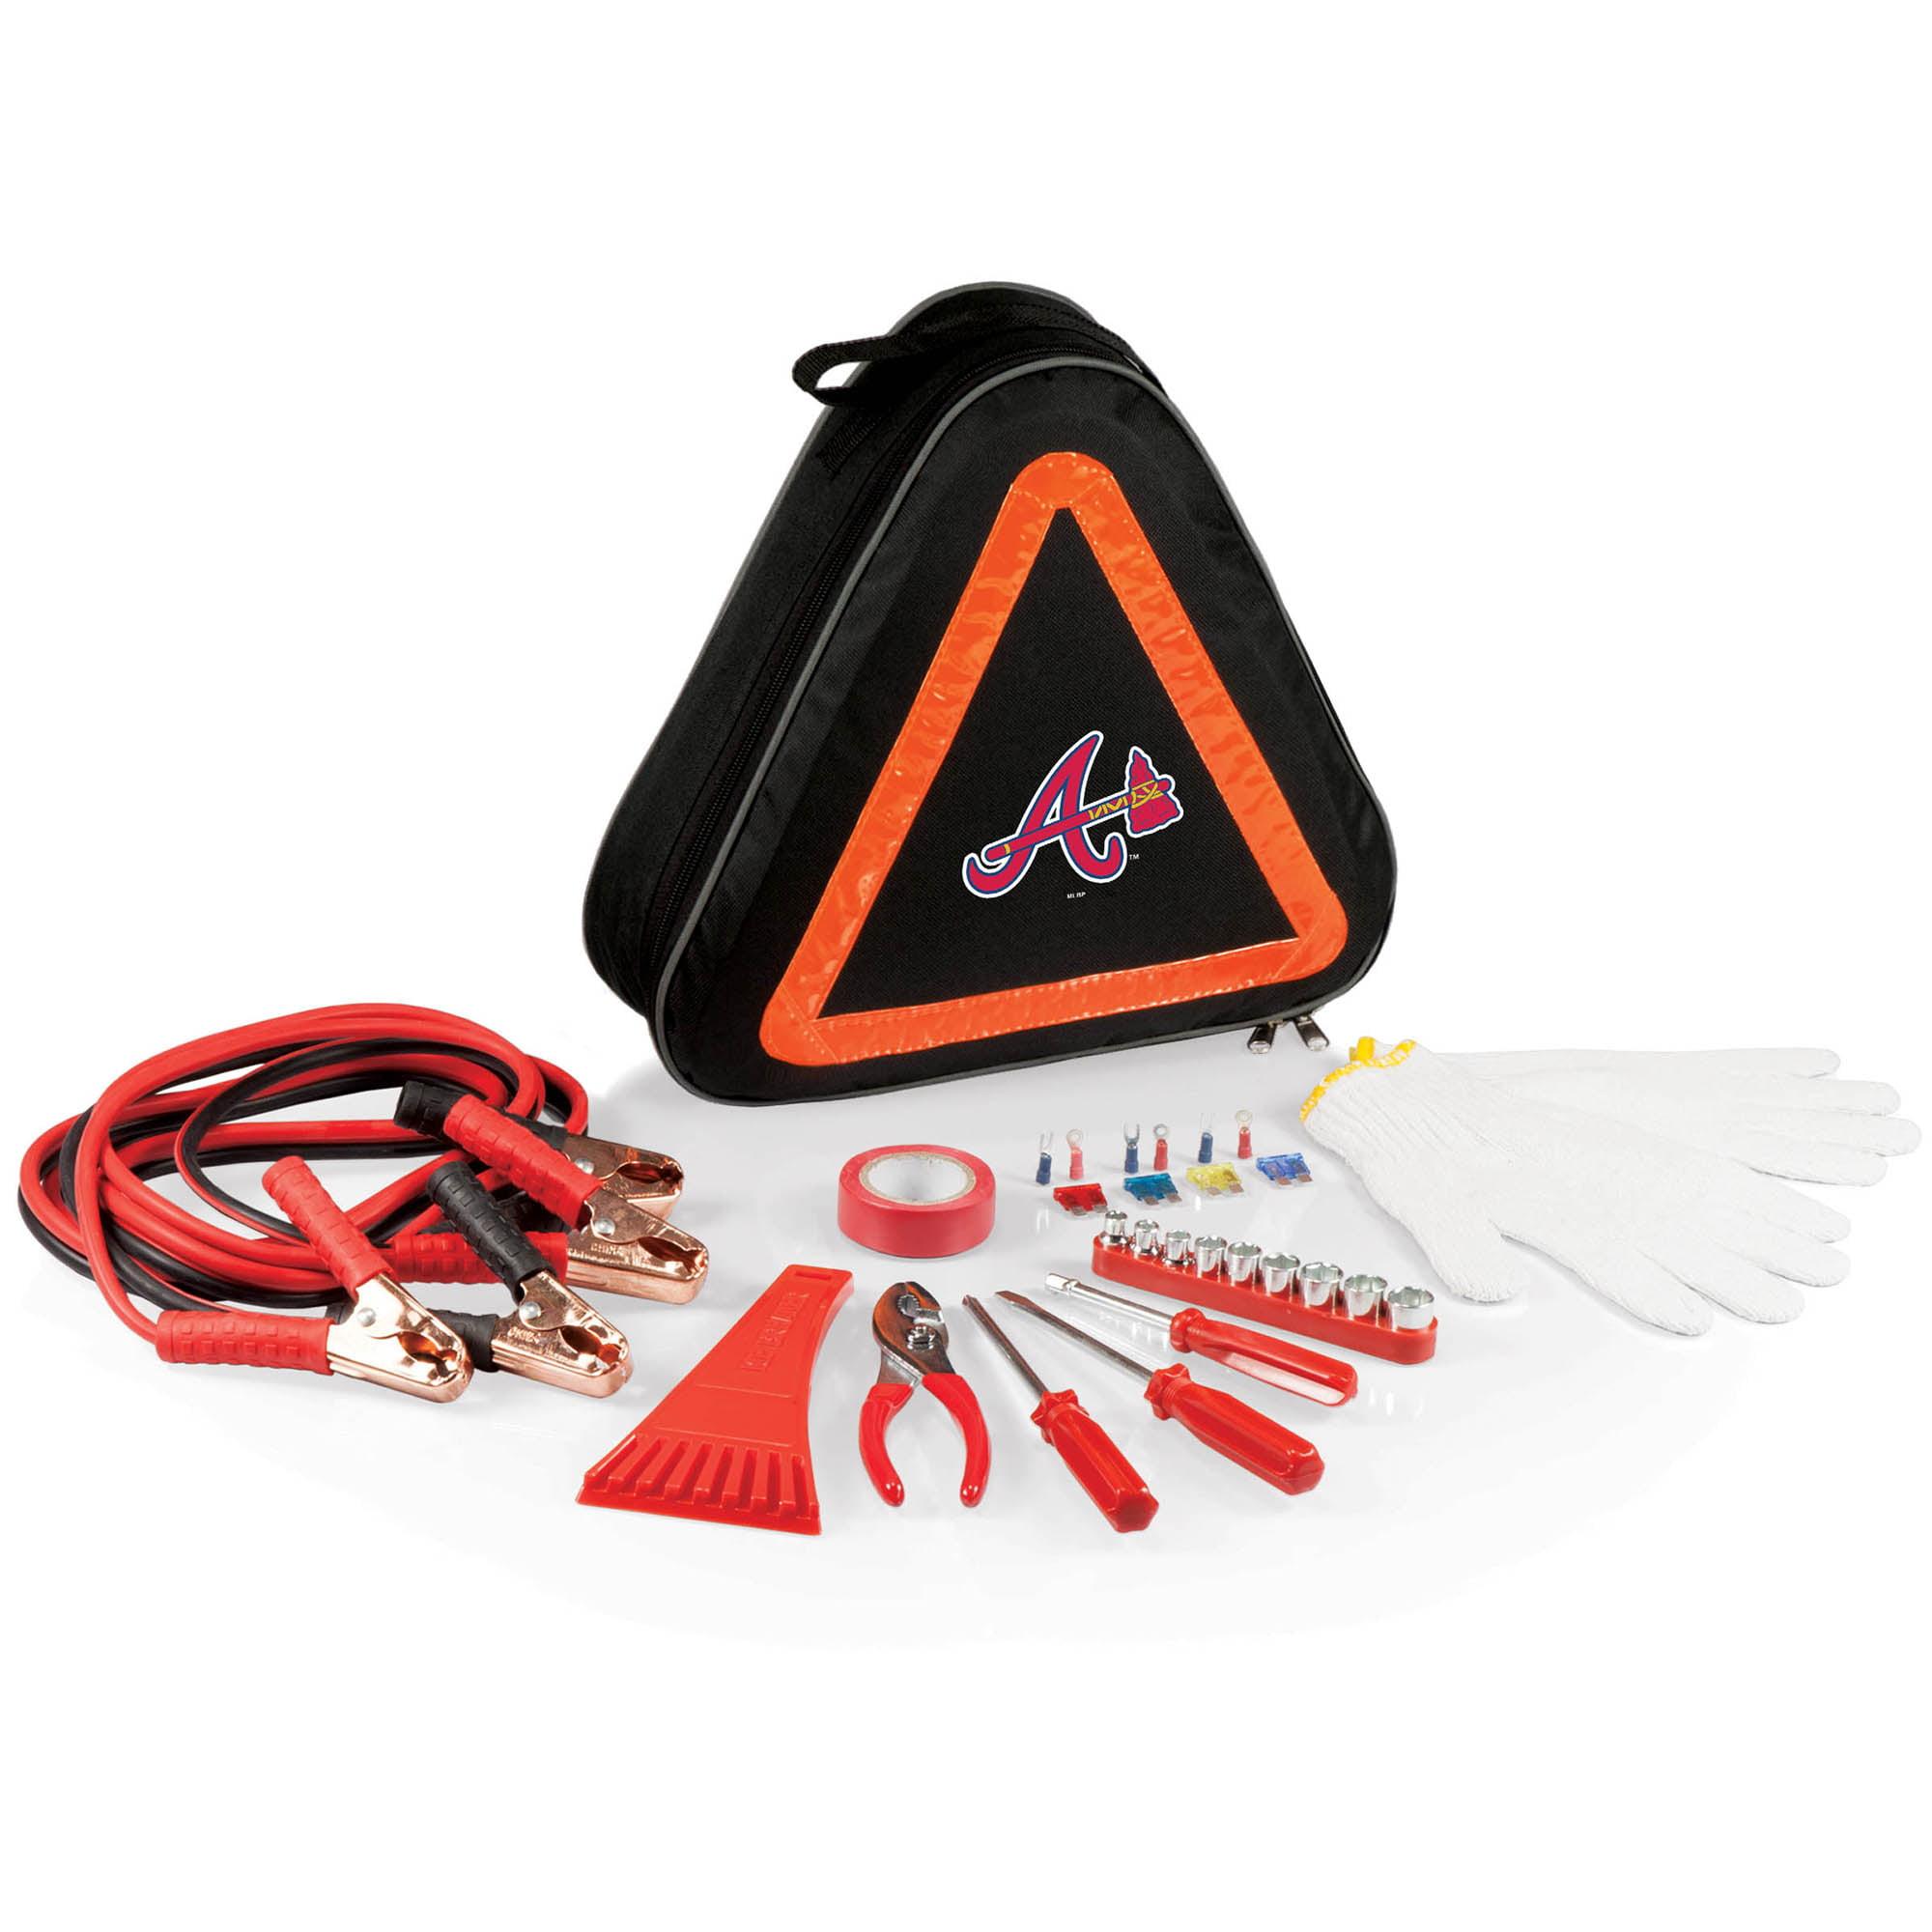 Atlanta Braves Roadside Emergency Kit - No Size